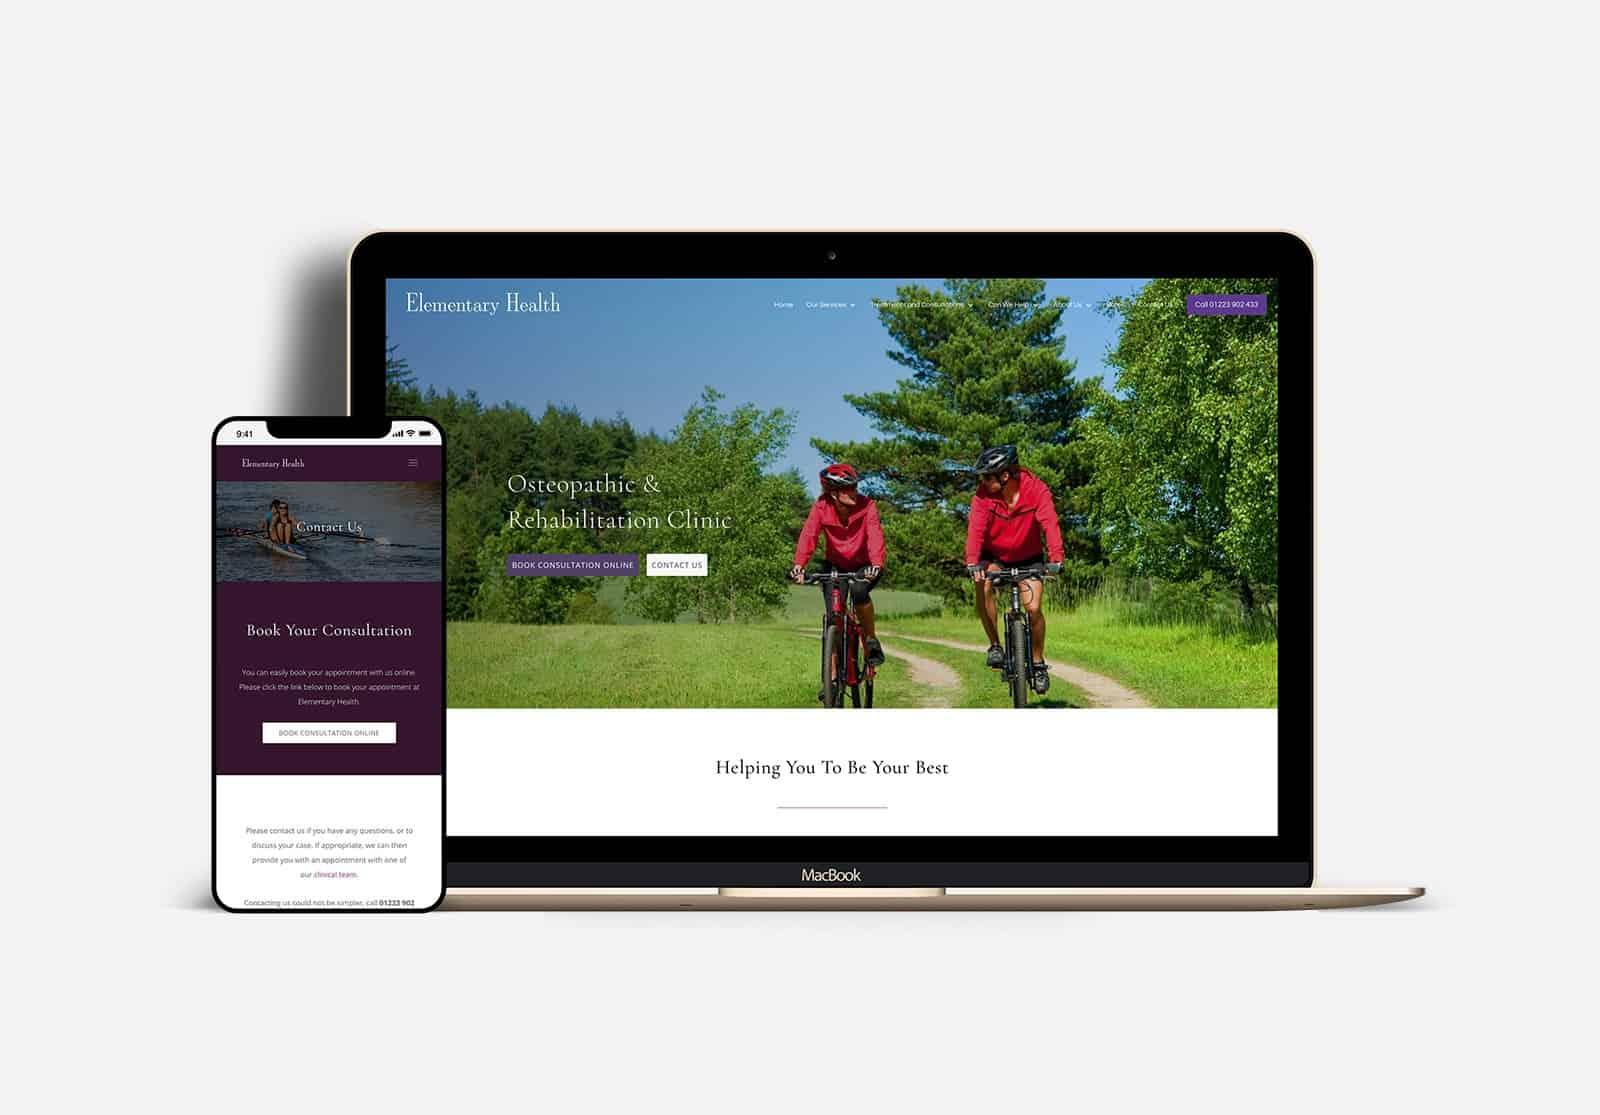 elementary health reponsive web design